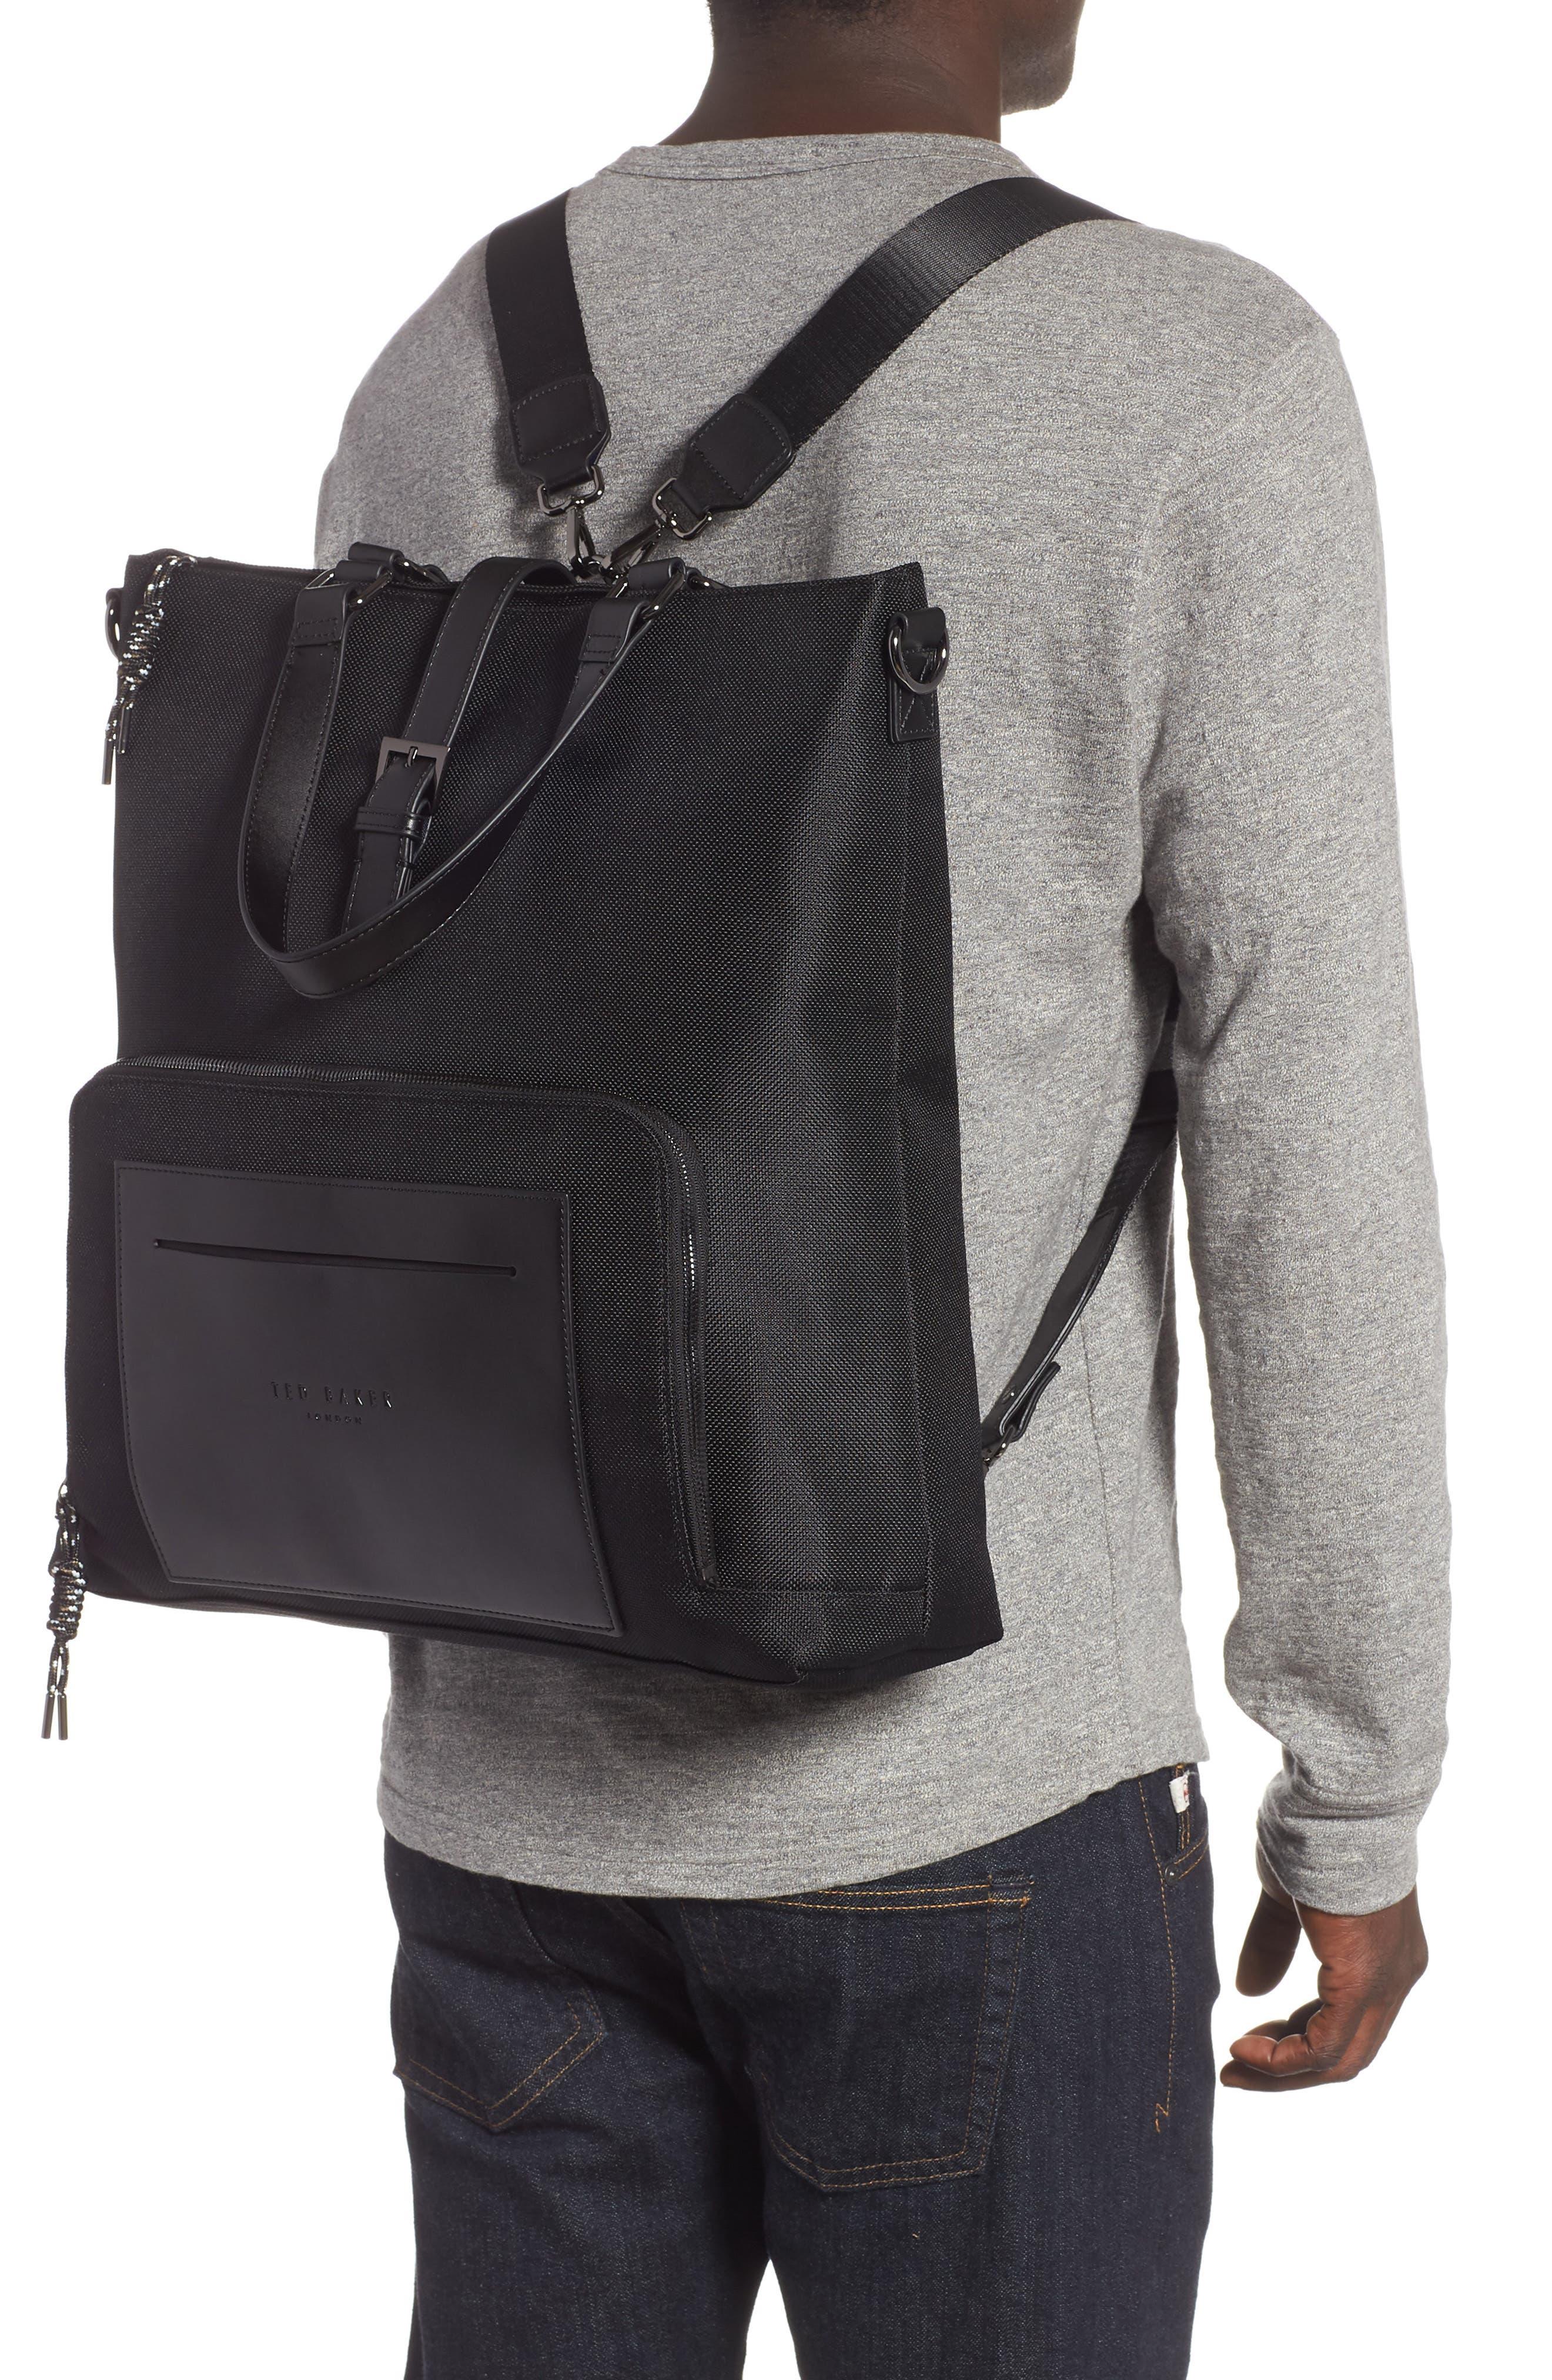 Tidee Convertible Backpack,                             Alternate thumbnail 2, color,                             BLACK